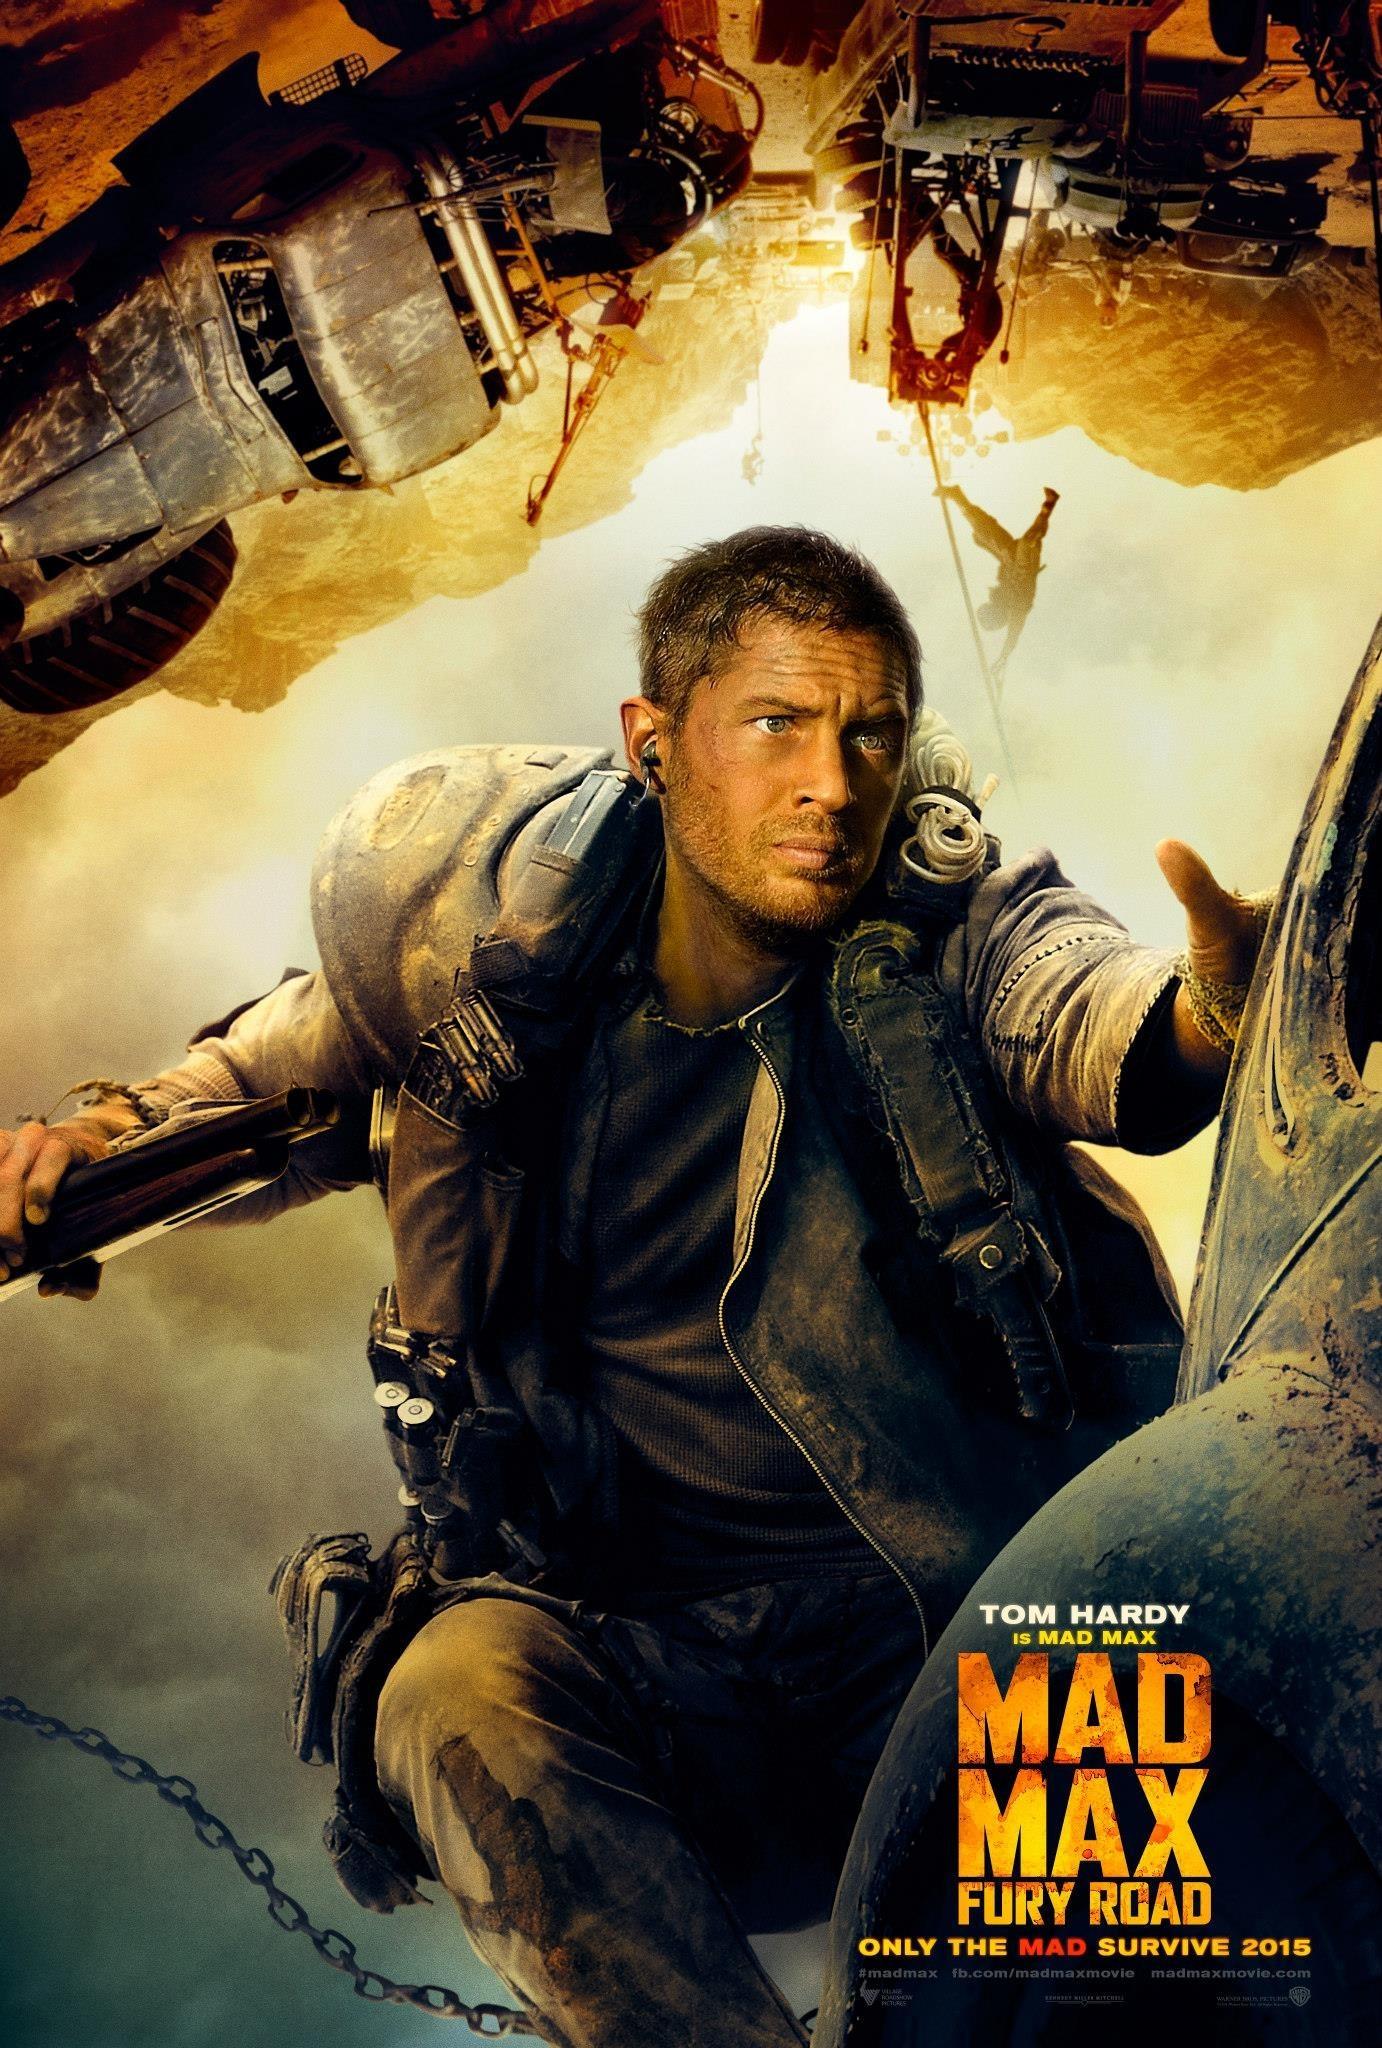 Wallpaper : movies, comics, poster, Mad Max Fury Road, Tom ...